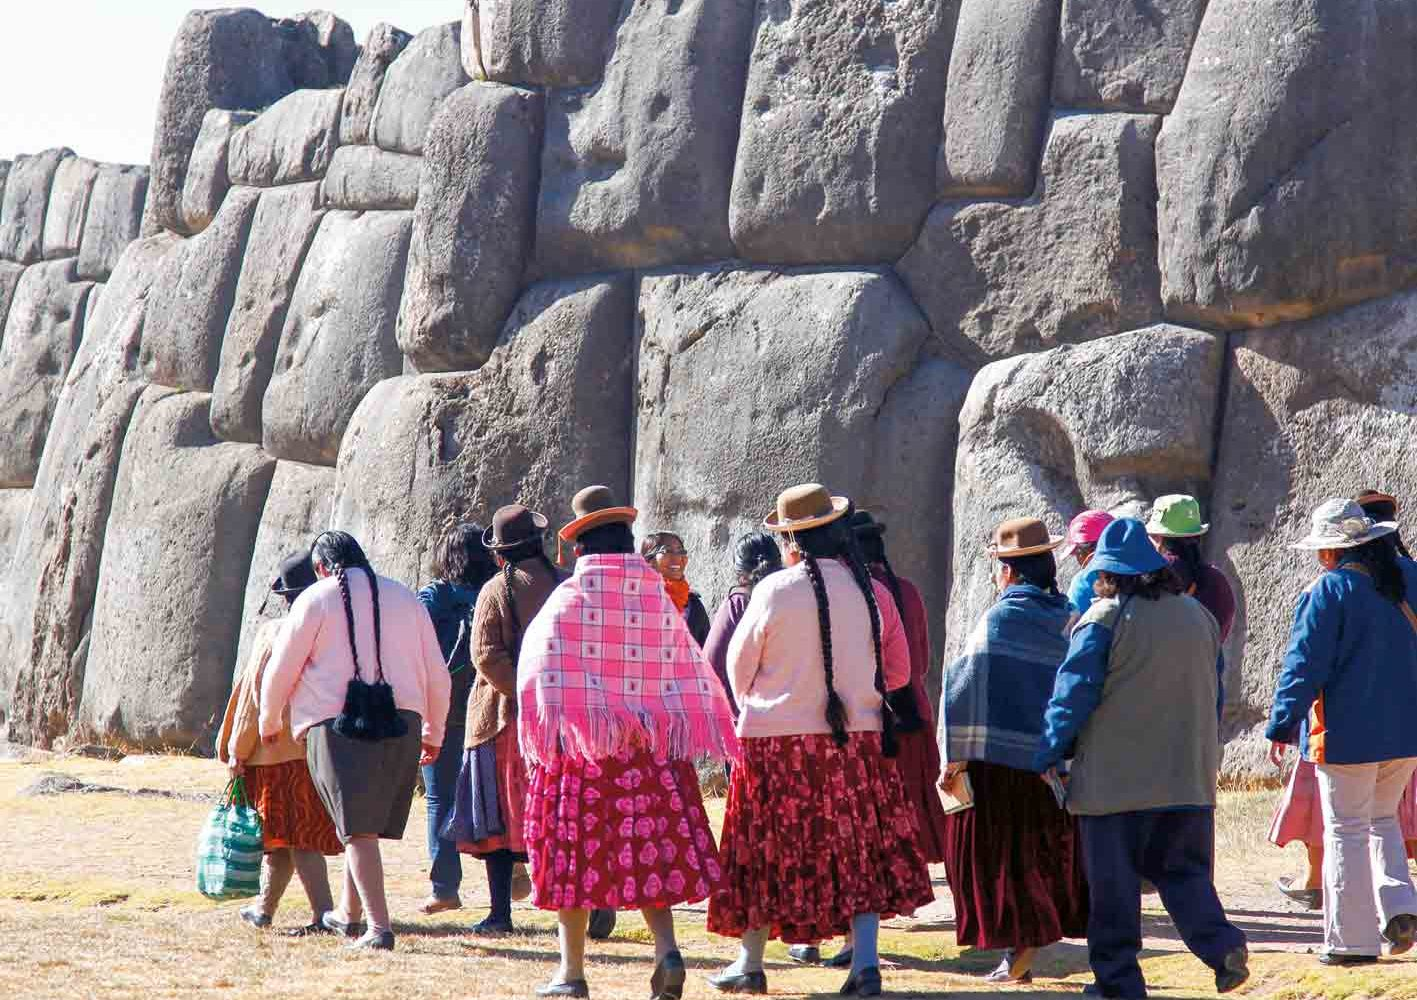 Inka-Stätte Saqsayhuamán bei Cuzco, Peru